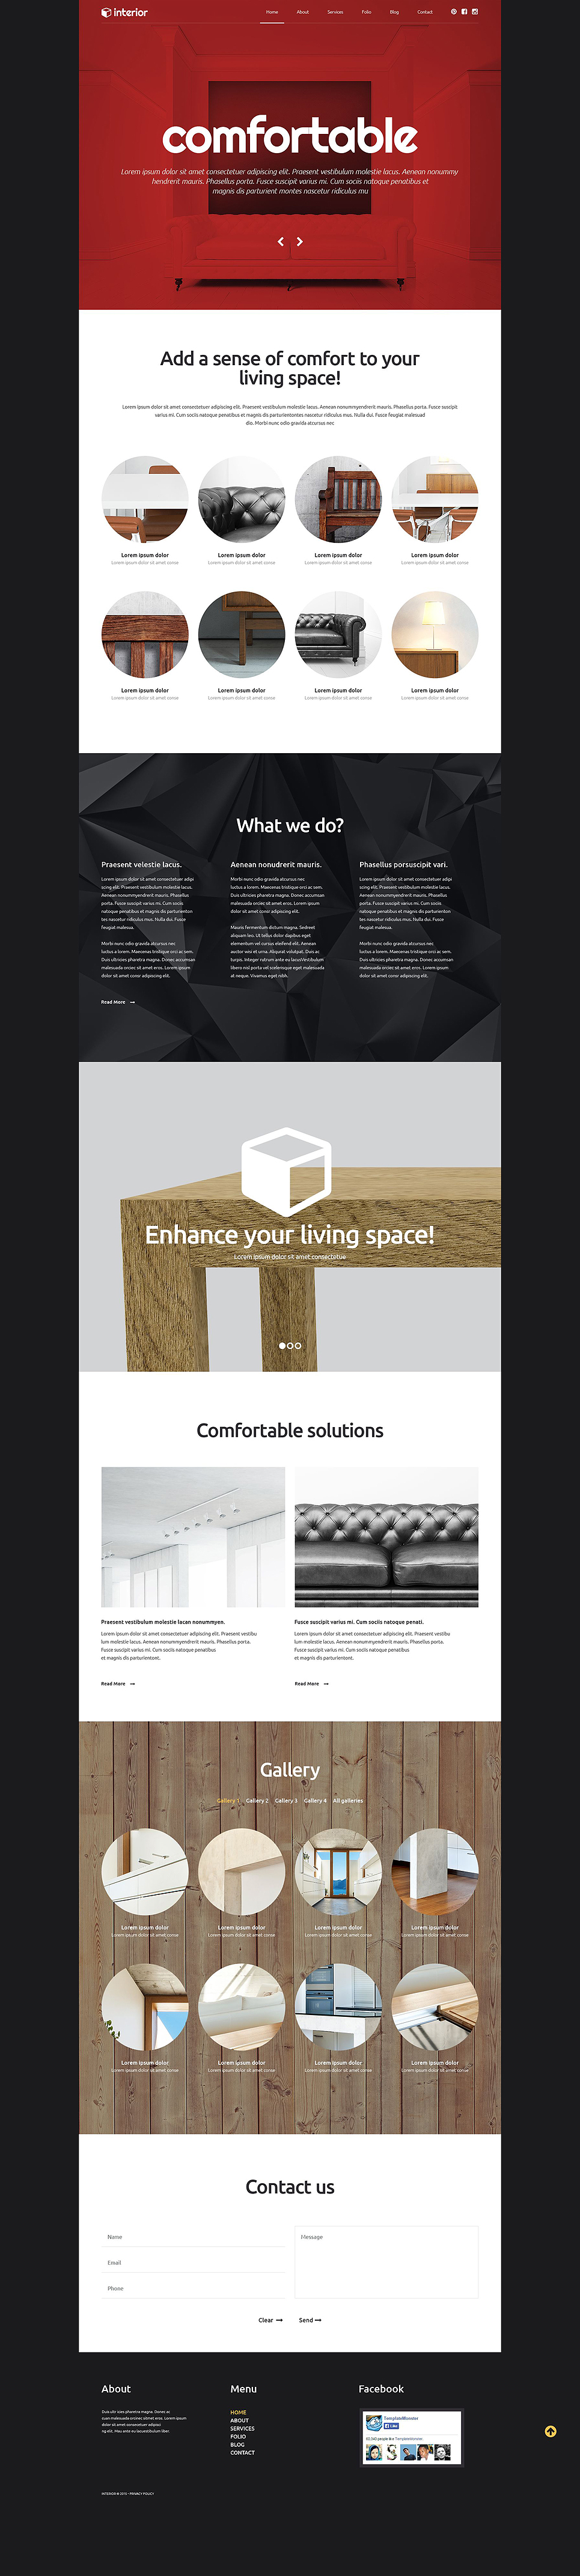 Адаптивный шаблон сайта на тему дизайн и интерьер #54038